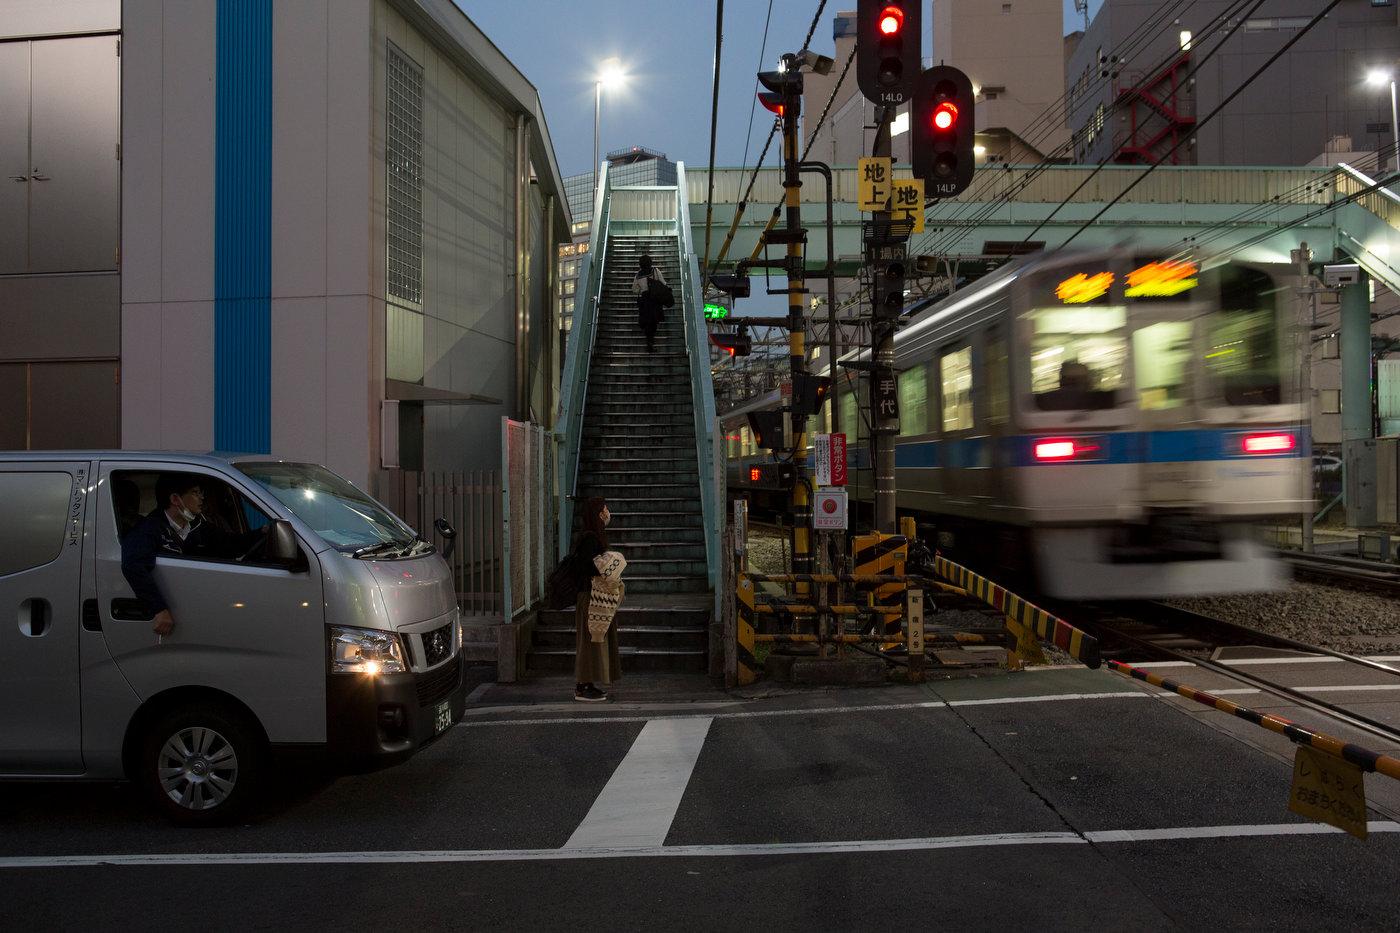 TokyoProject_Mingasson_070